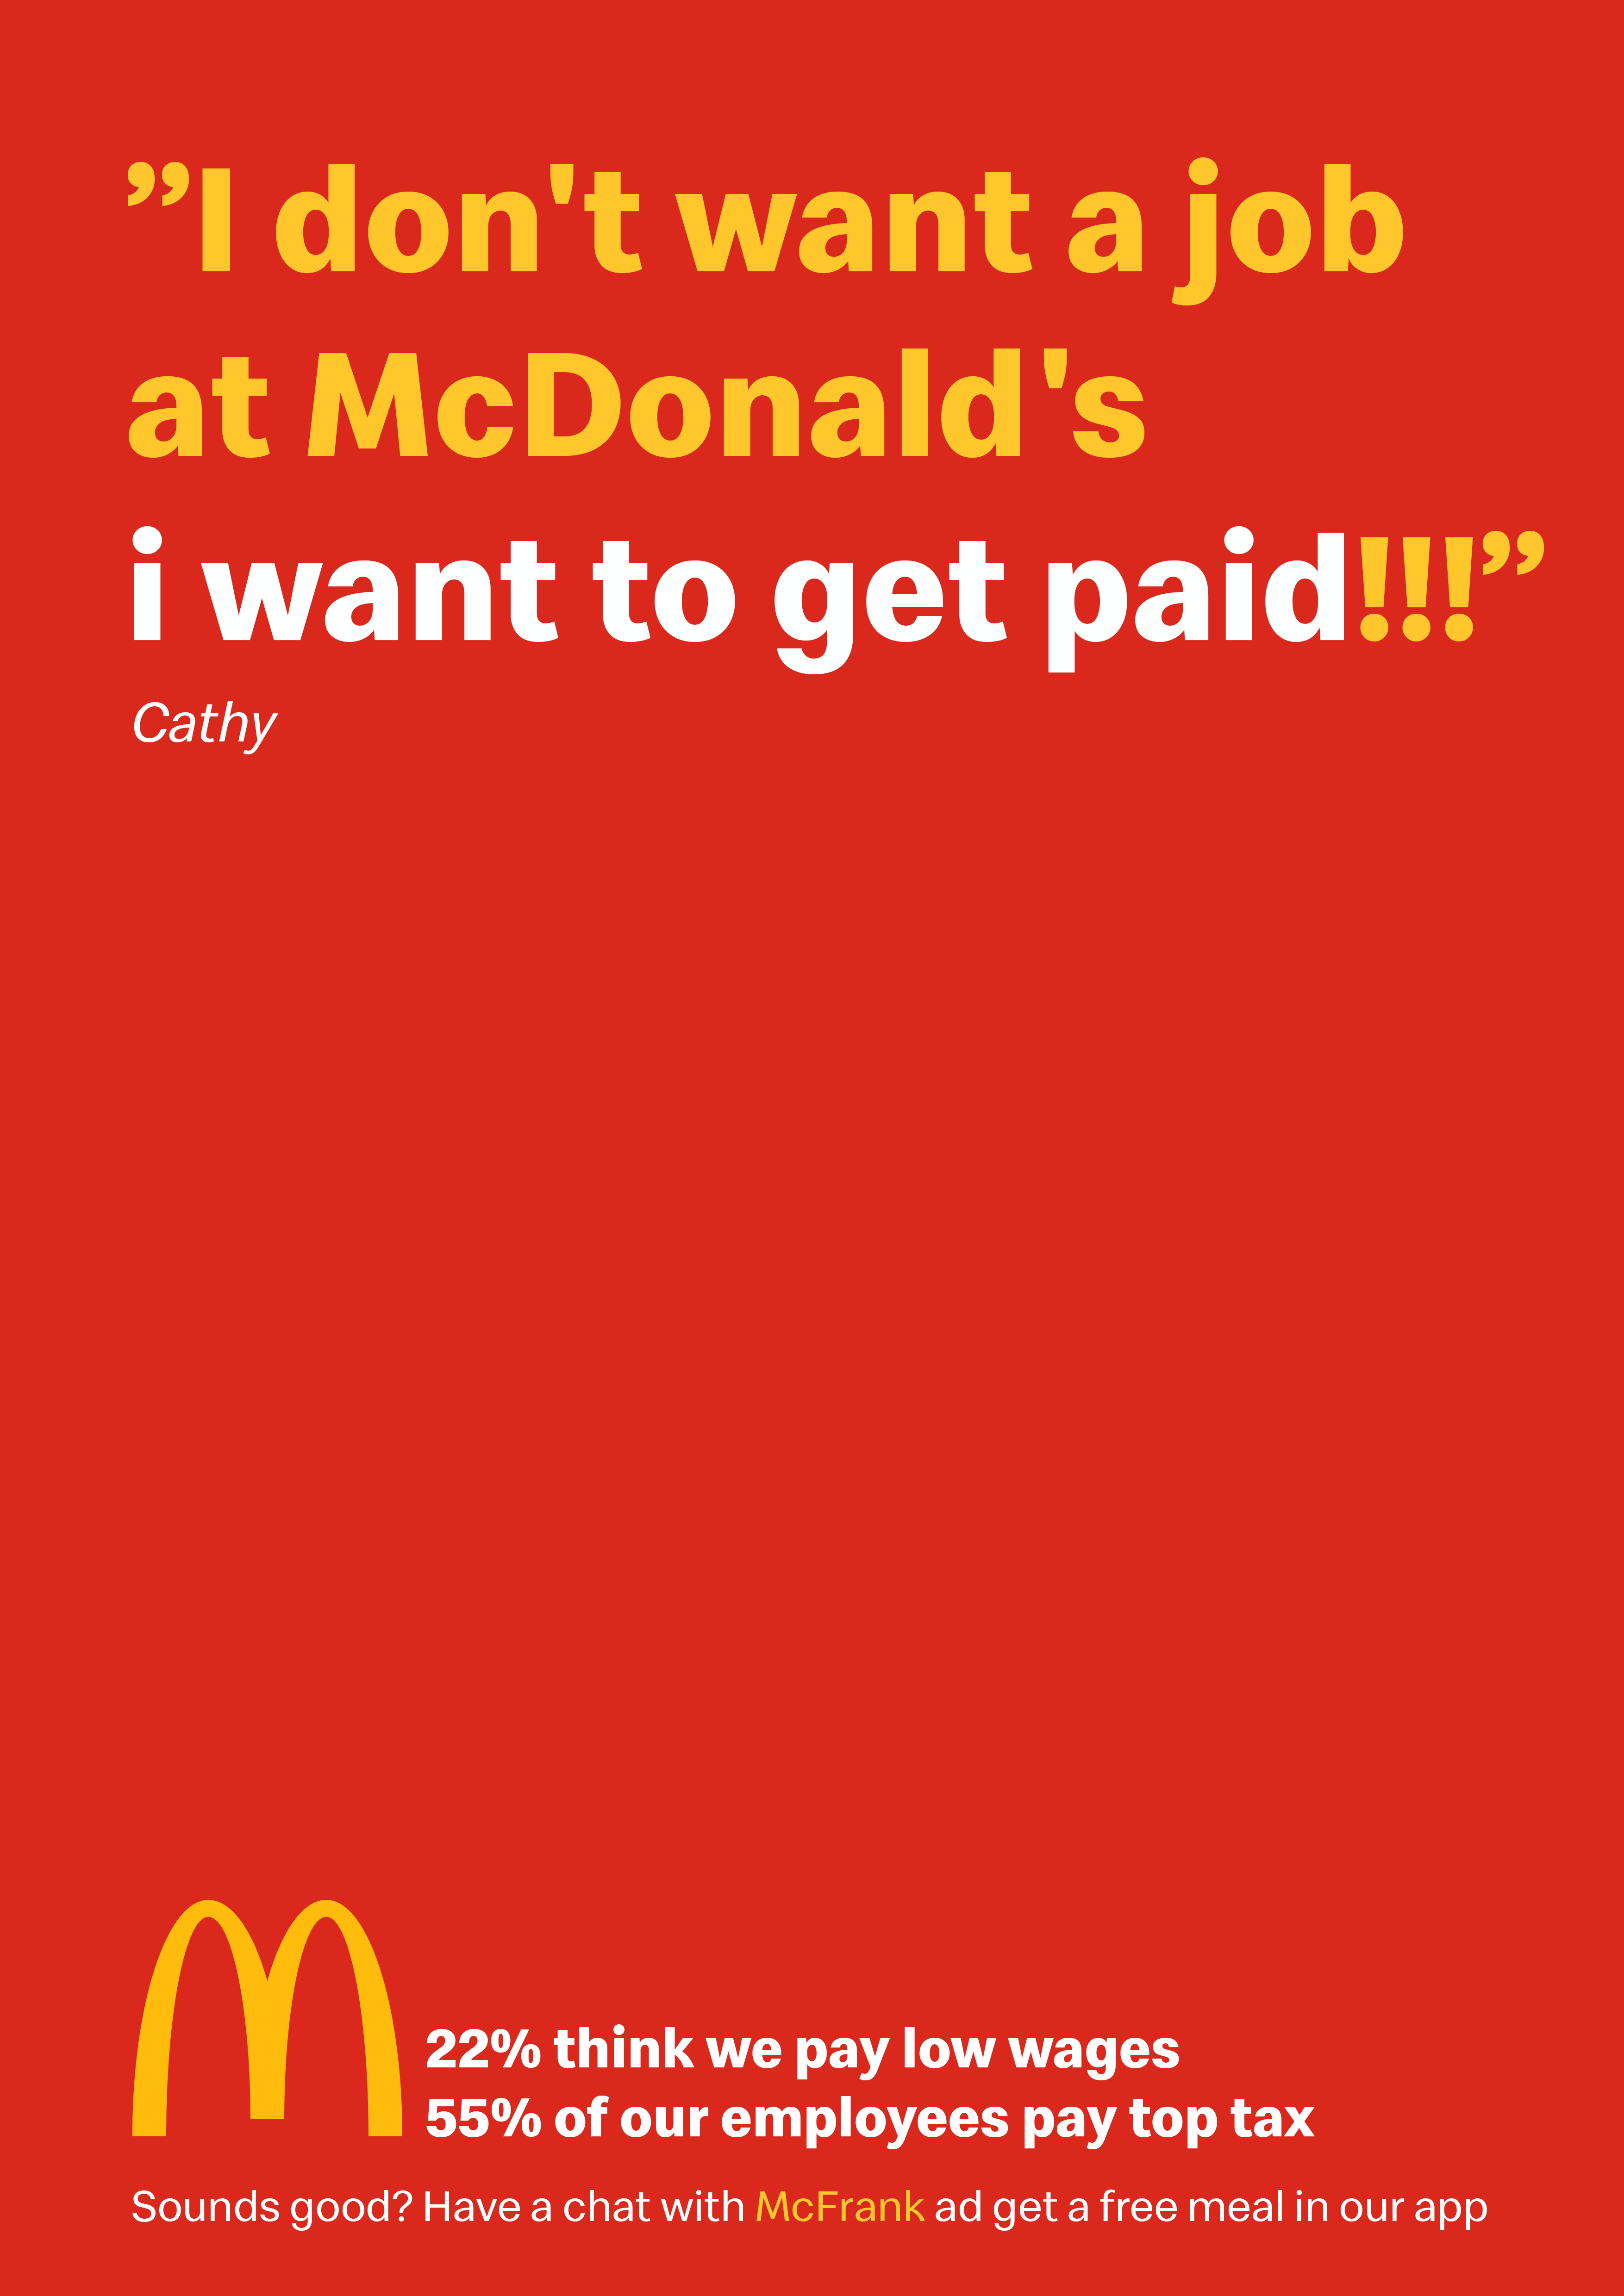 McFrank for McDonalds | Ulik Kepinski Rode | Creative Portfolio